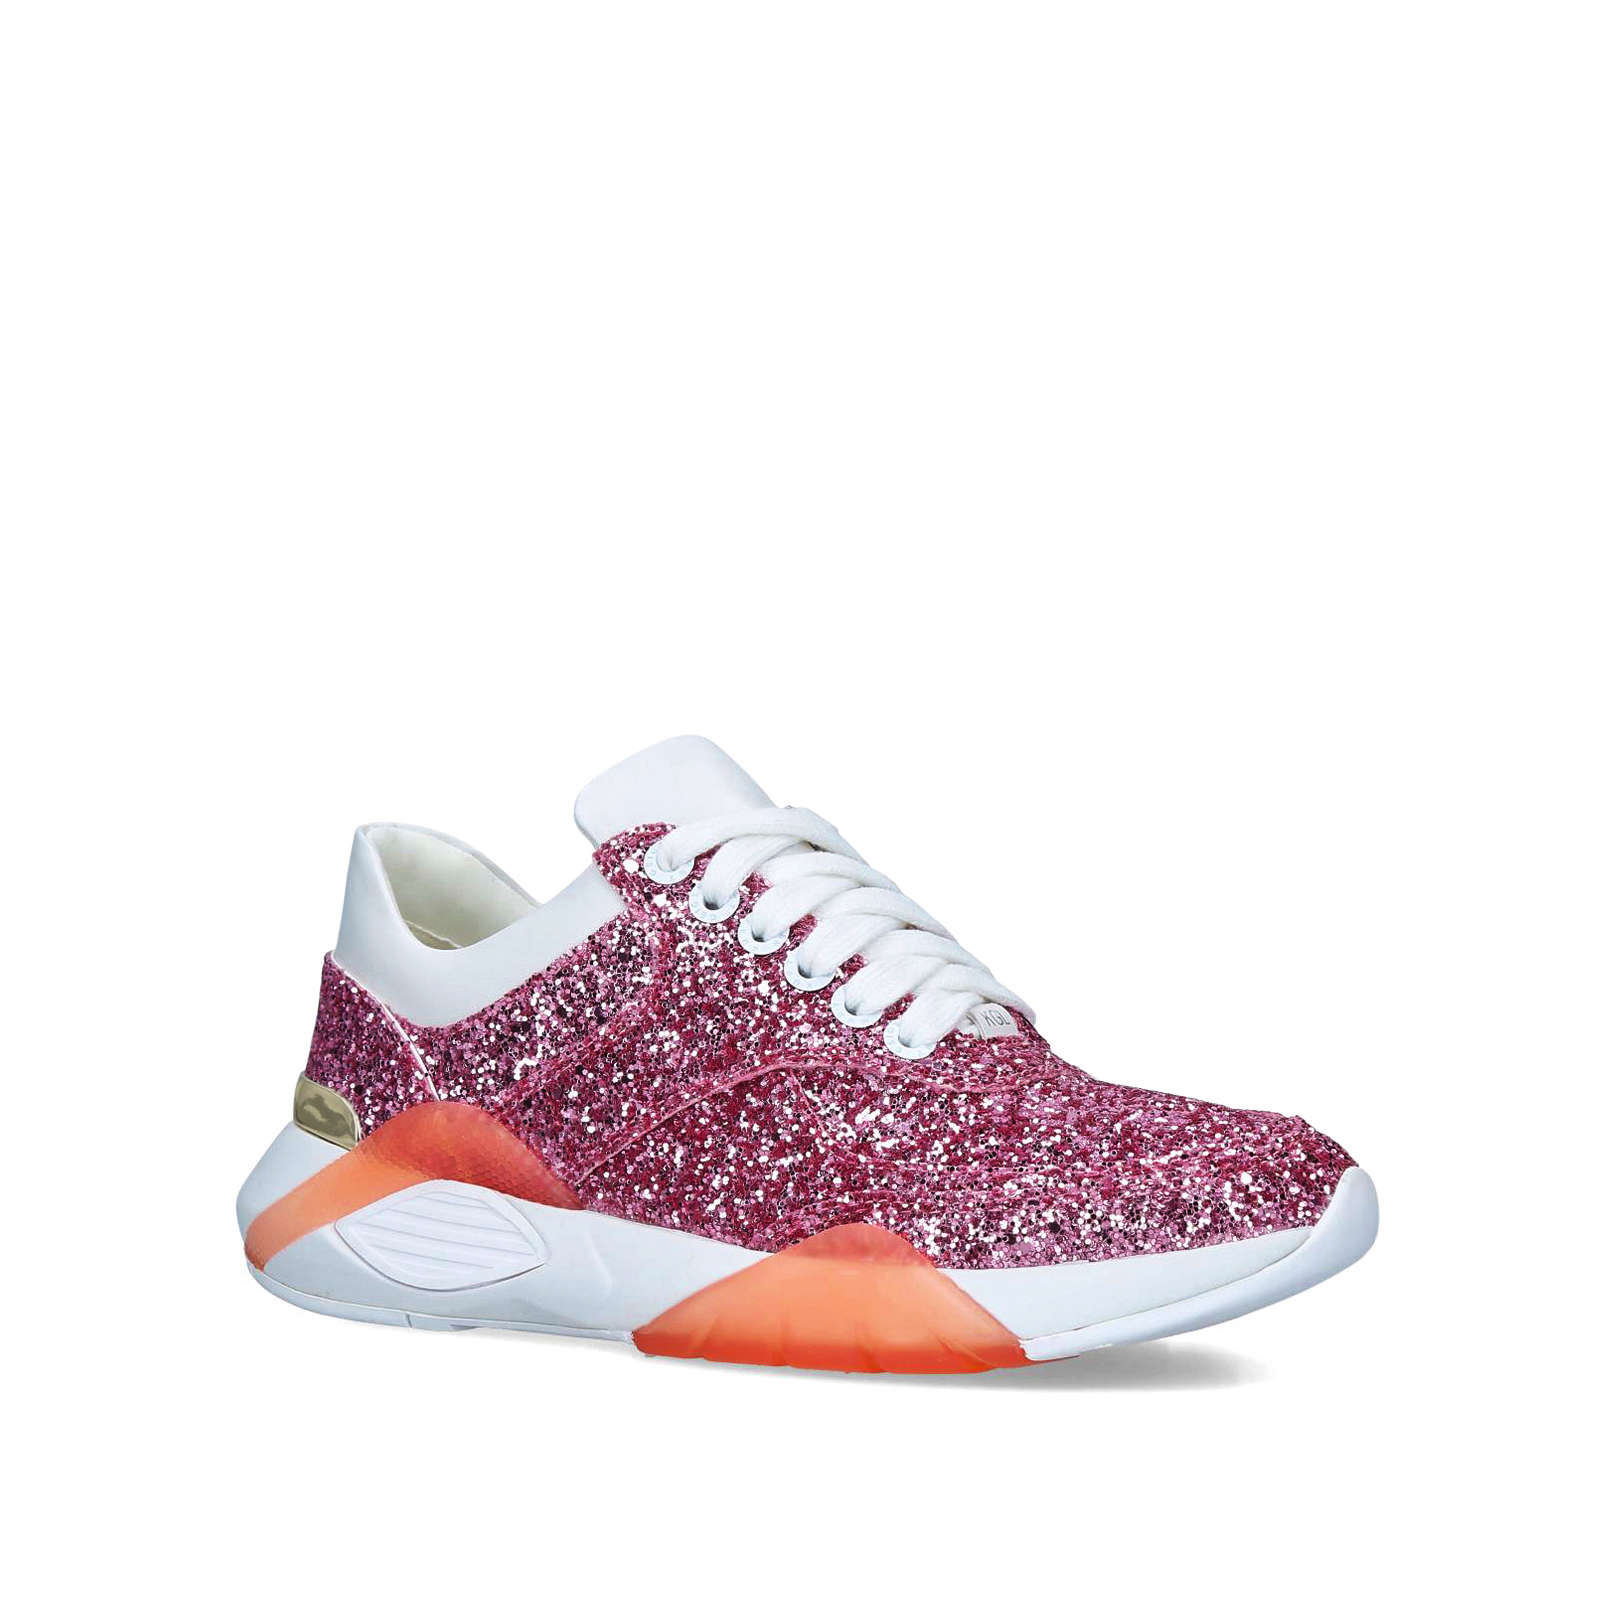 IRIS - KURT GEIGER LONDON Sneakers